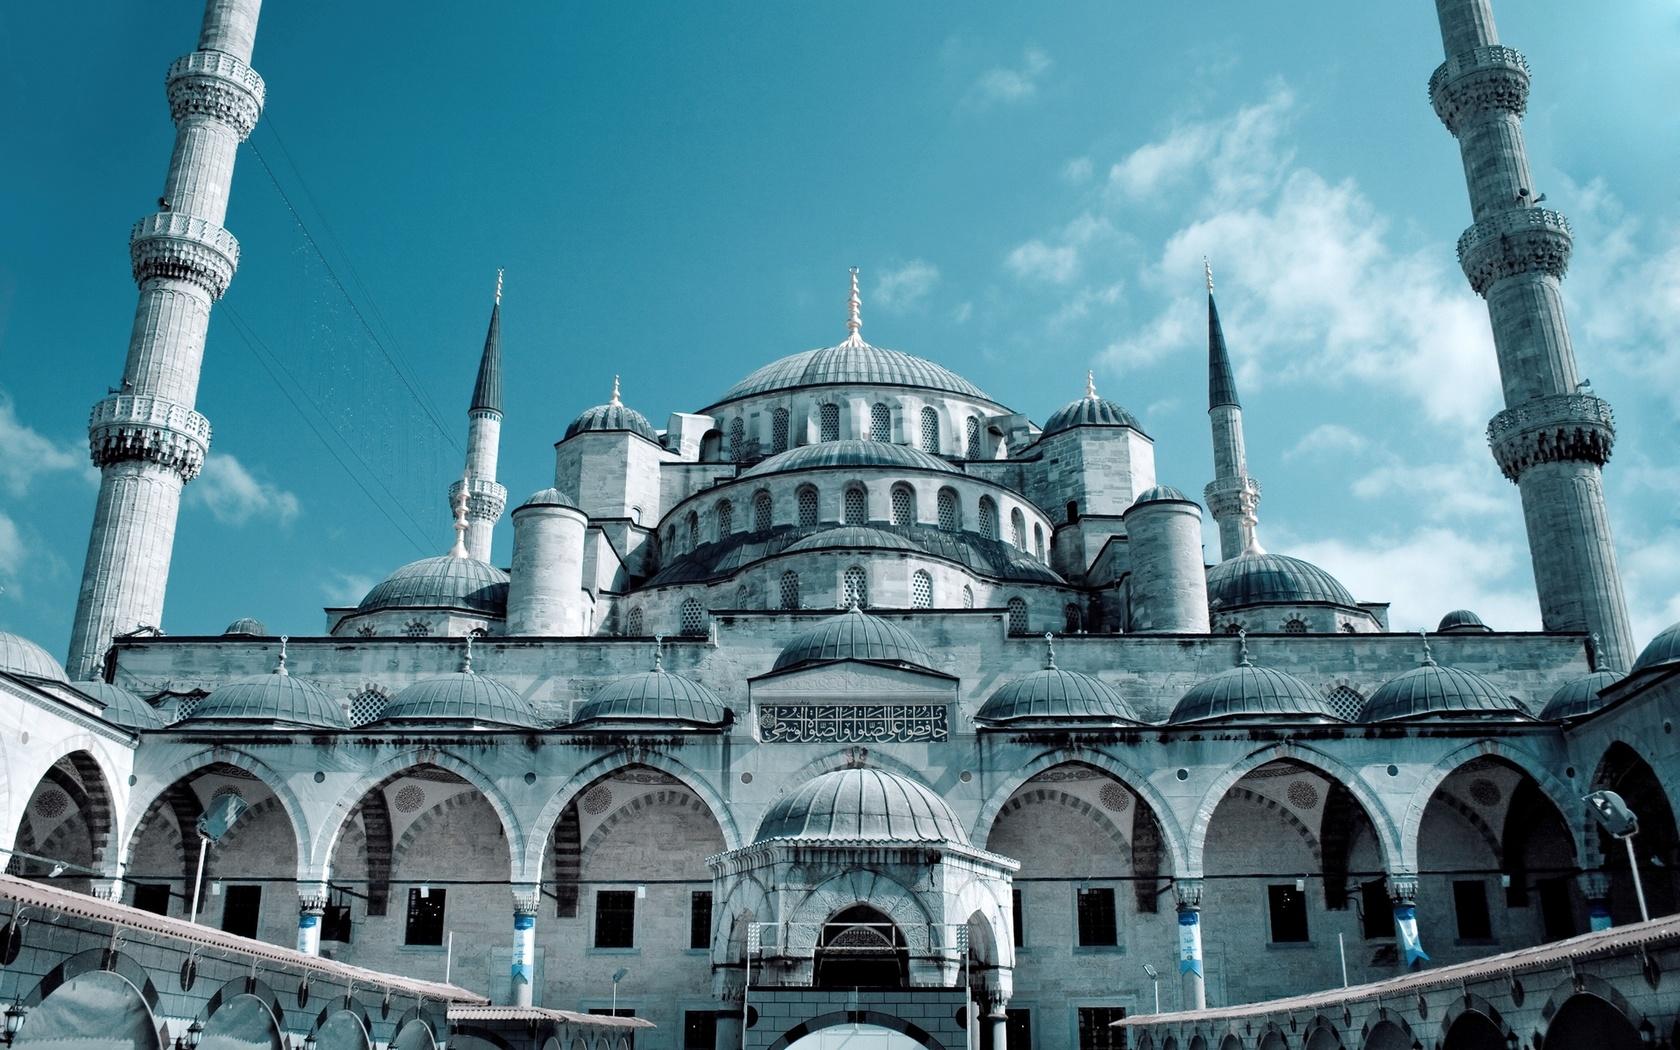 Grand mosque, istanbul, мечеть султанахмет, стамбул, турция